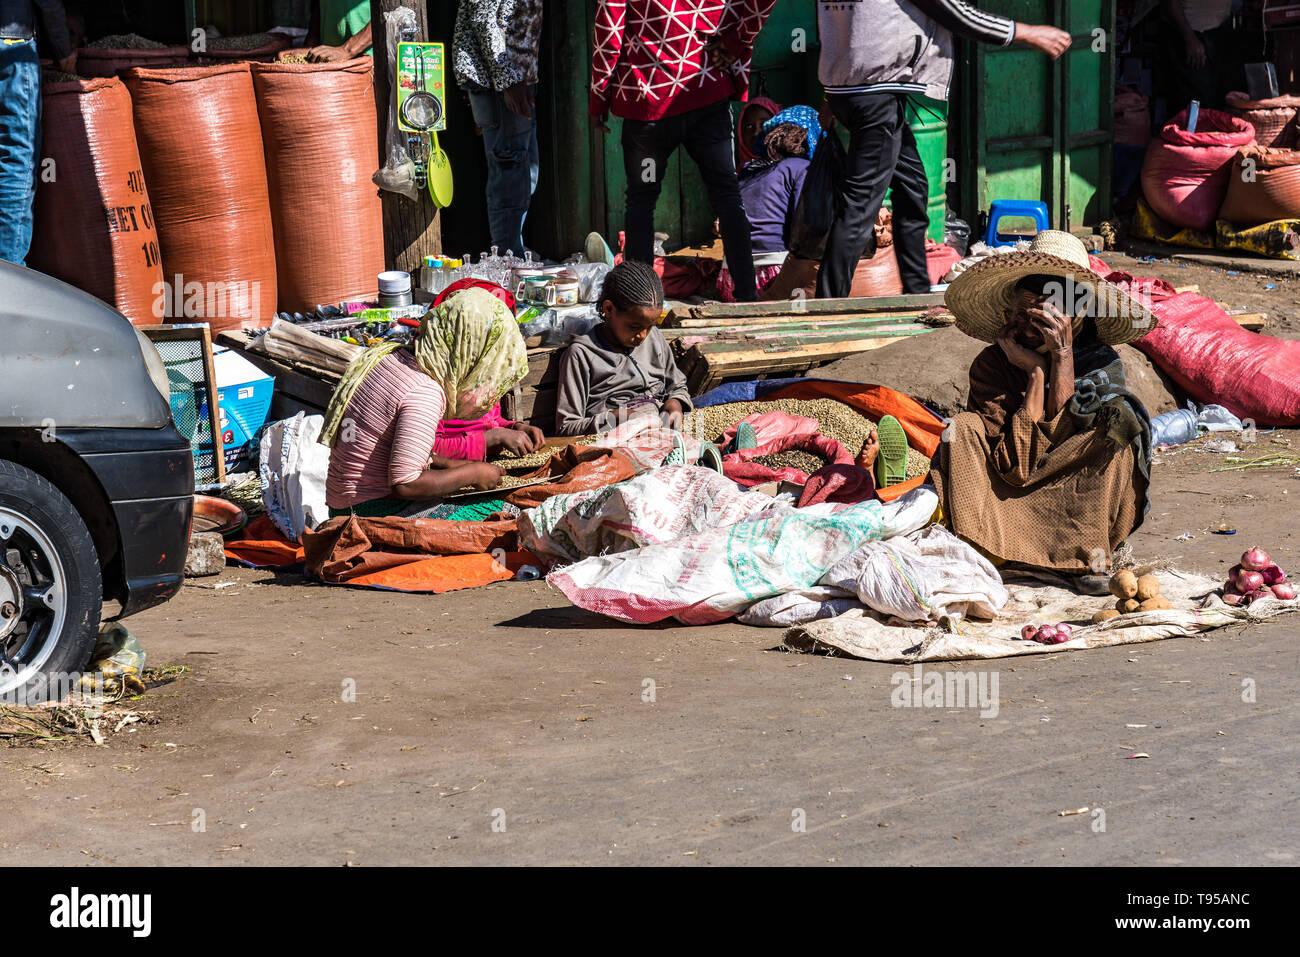 Addis Mercato in Addis Abeba, Ethiopia, the largest market in Africa. - Stock Image